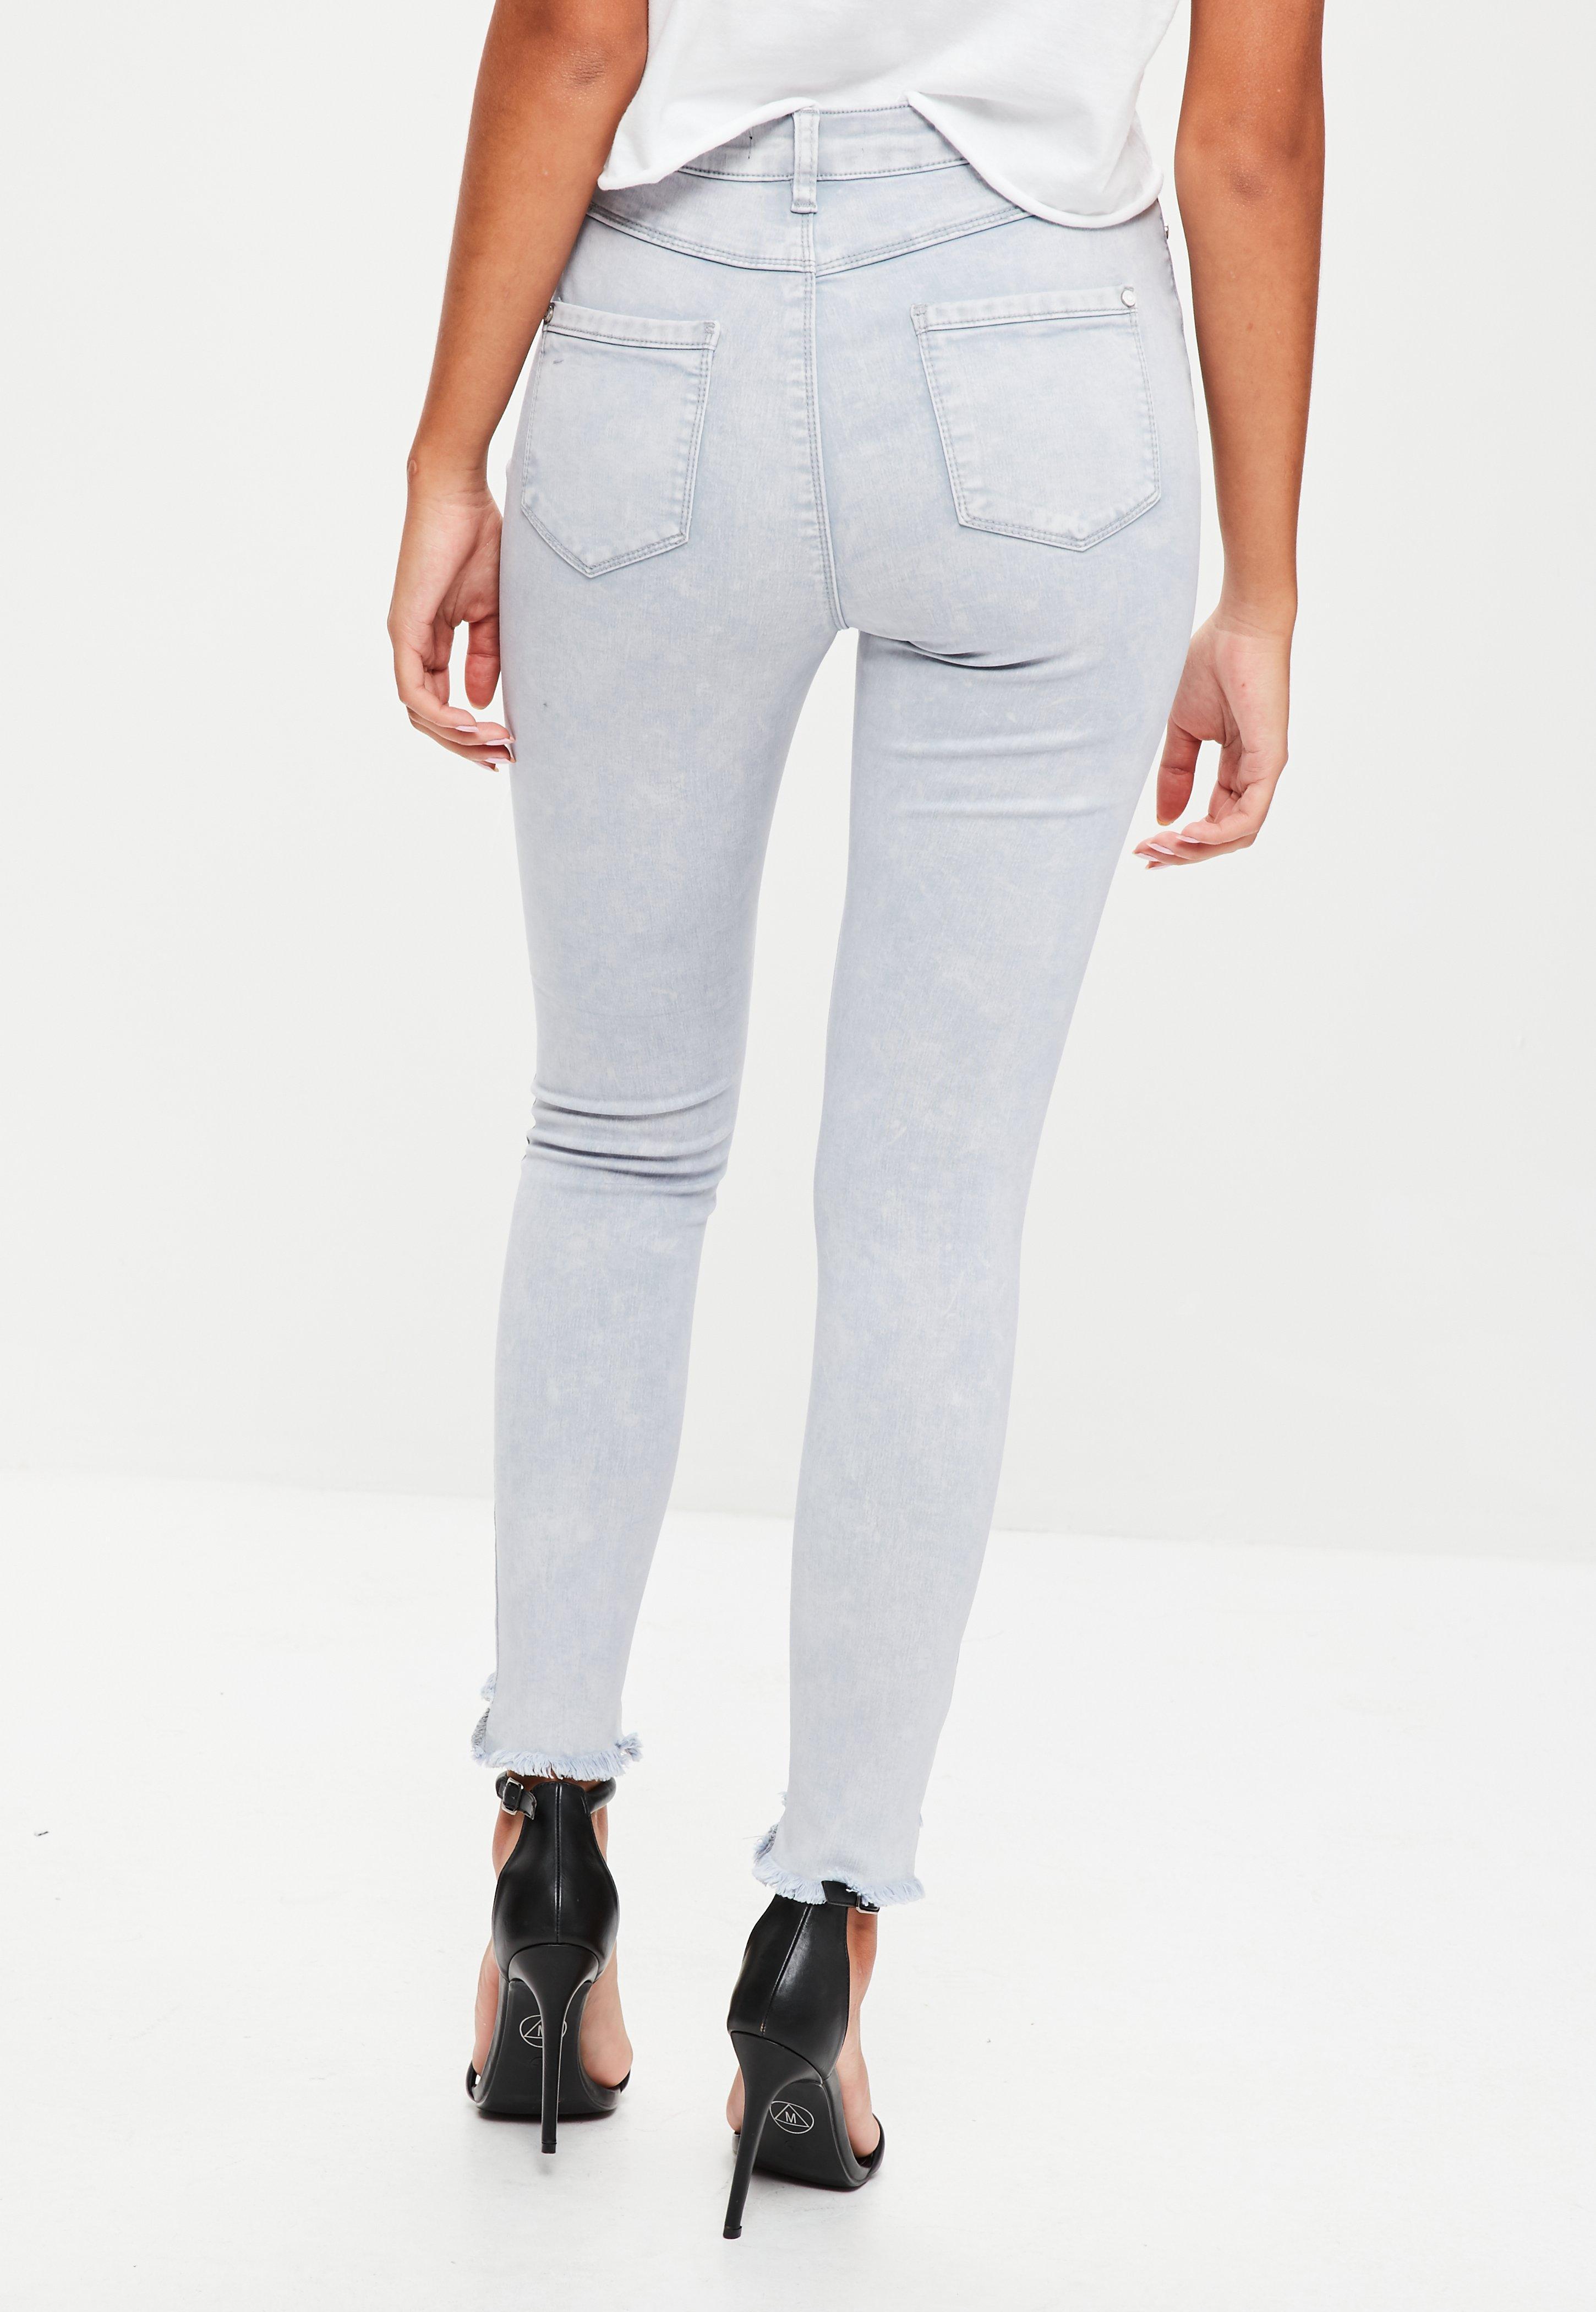 Missguided Denim Grey Sinner High Waisted Step Hem Jeans in Grey